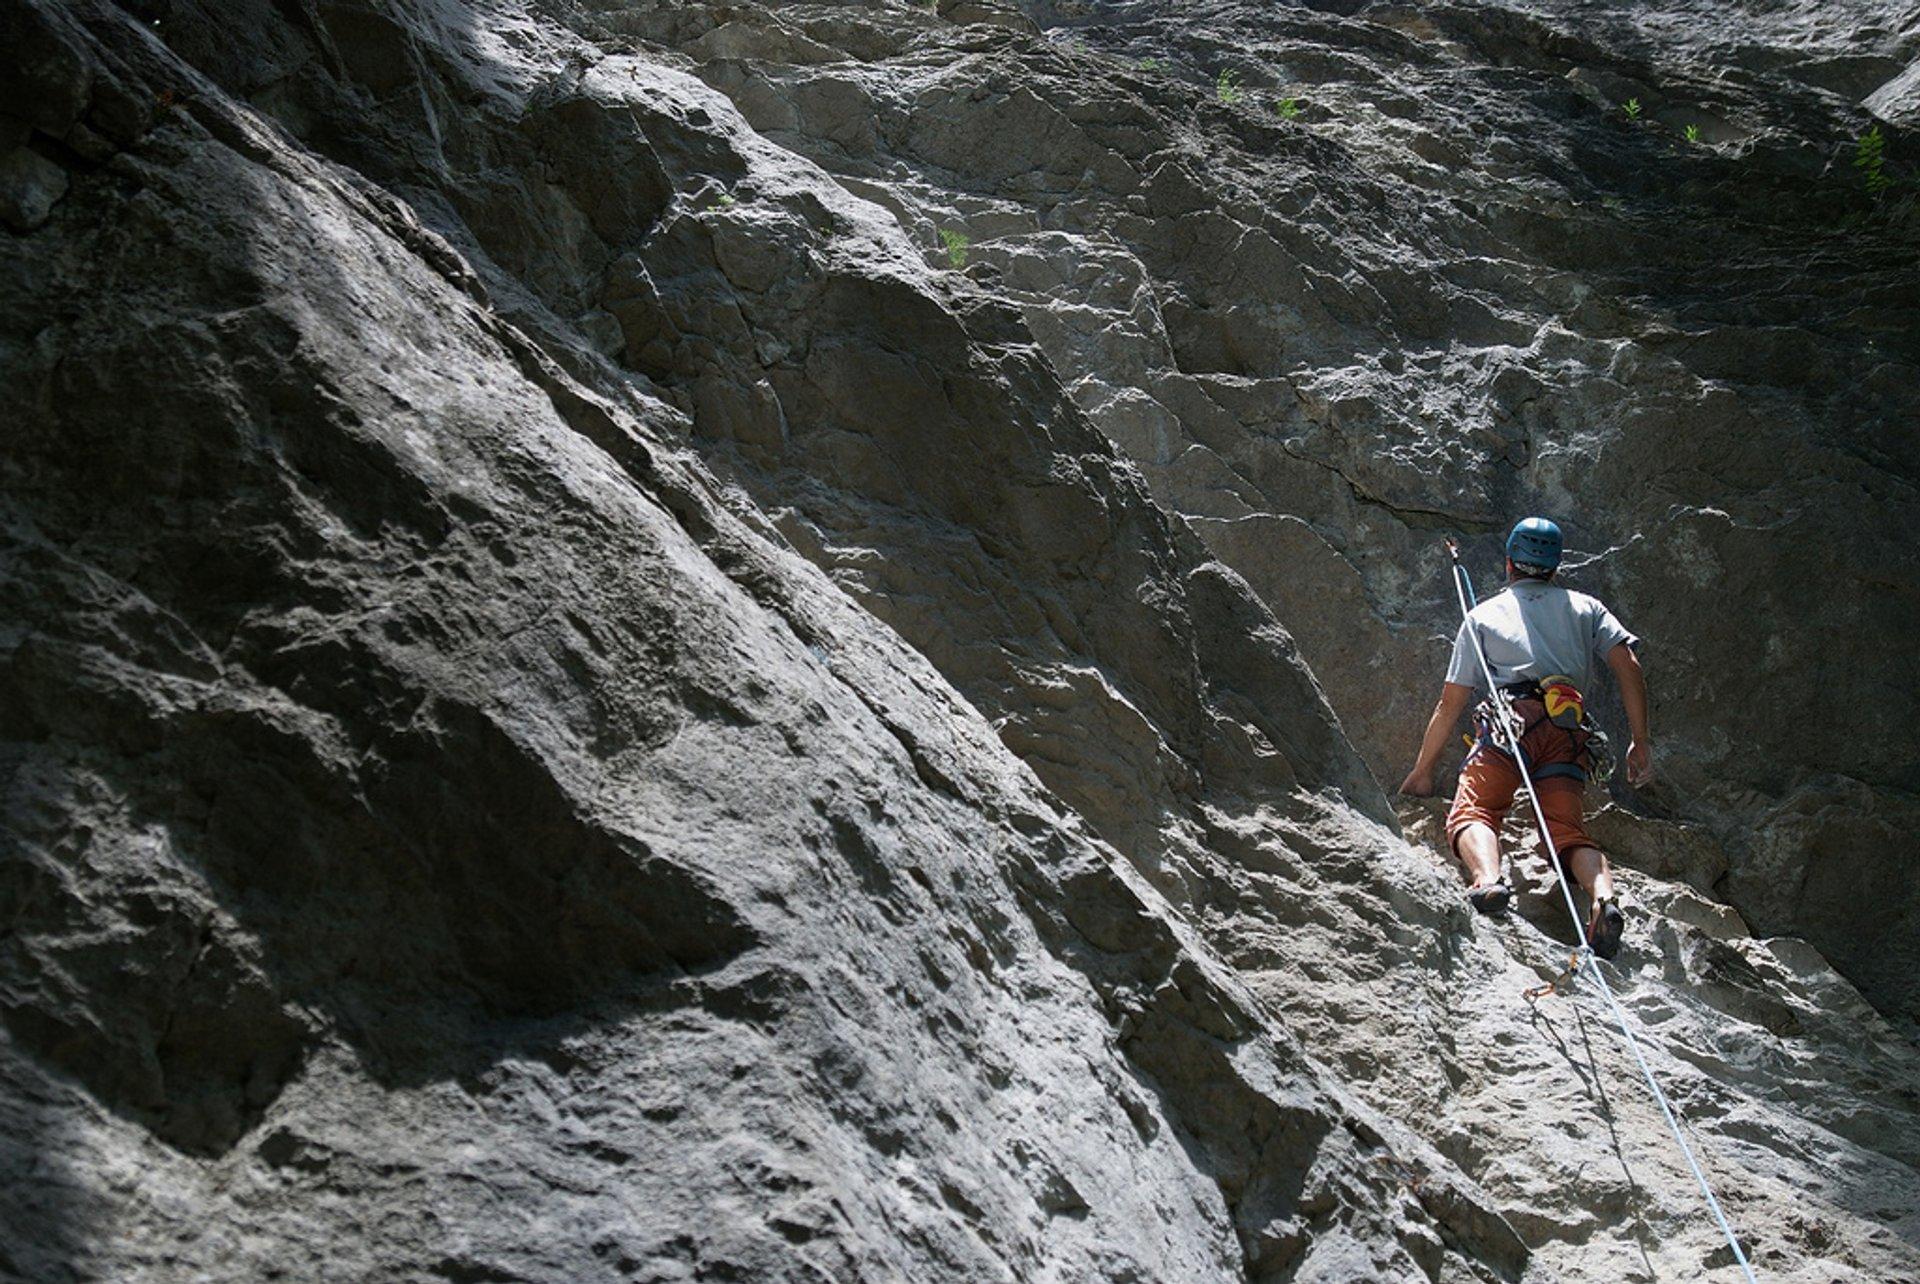 Rock Climbing in Slovakia 2020 - Best Time